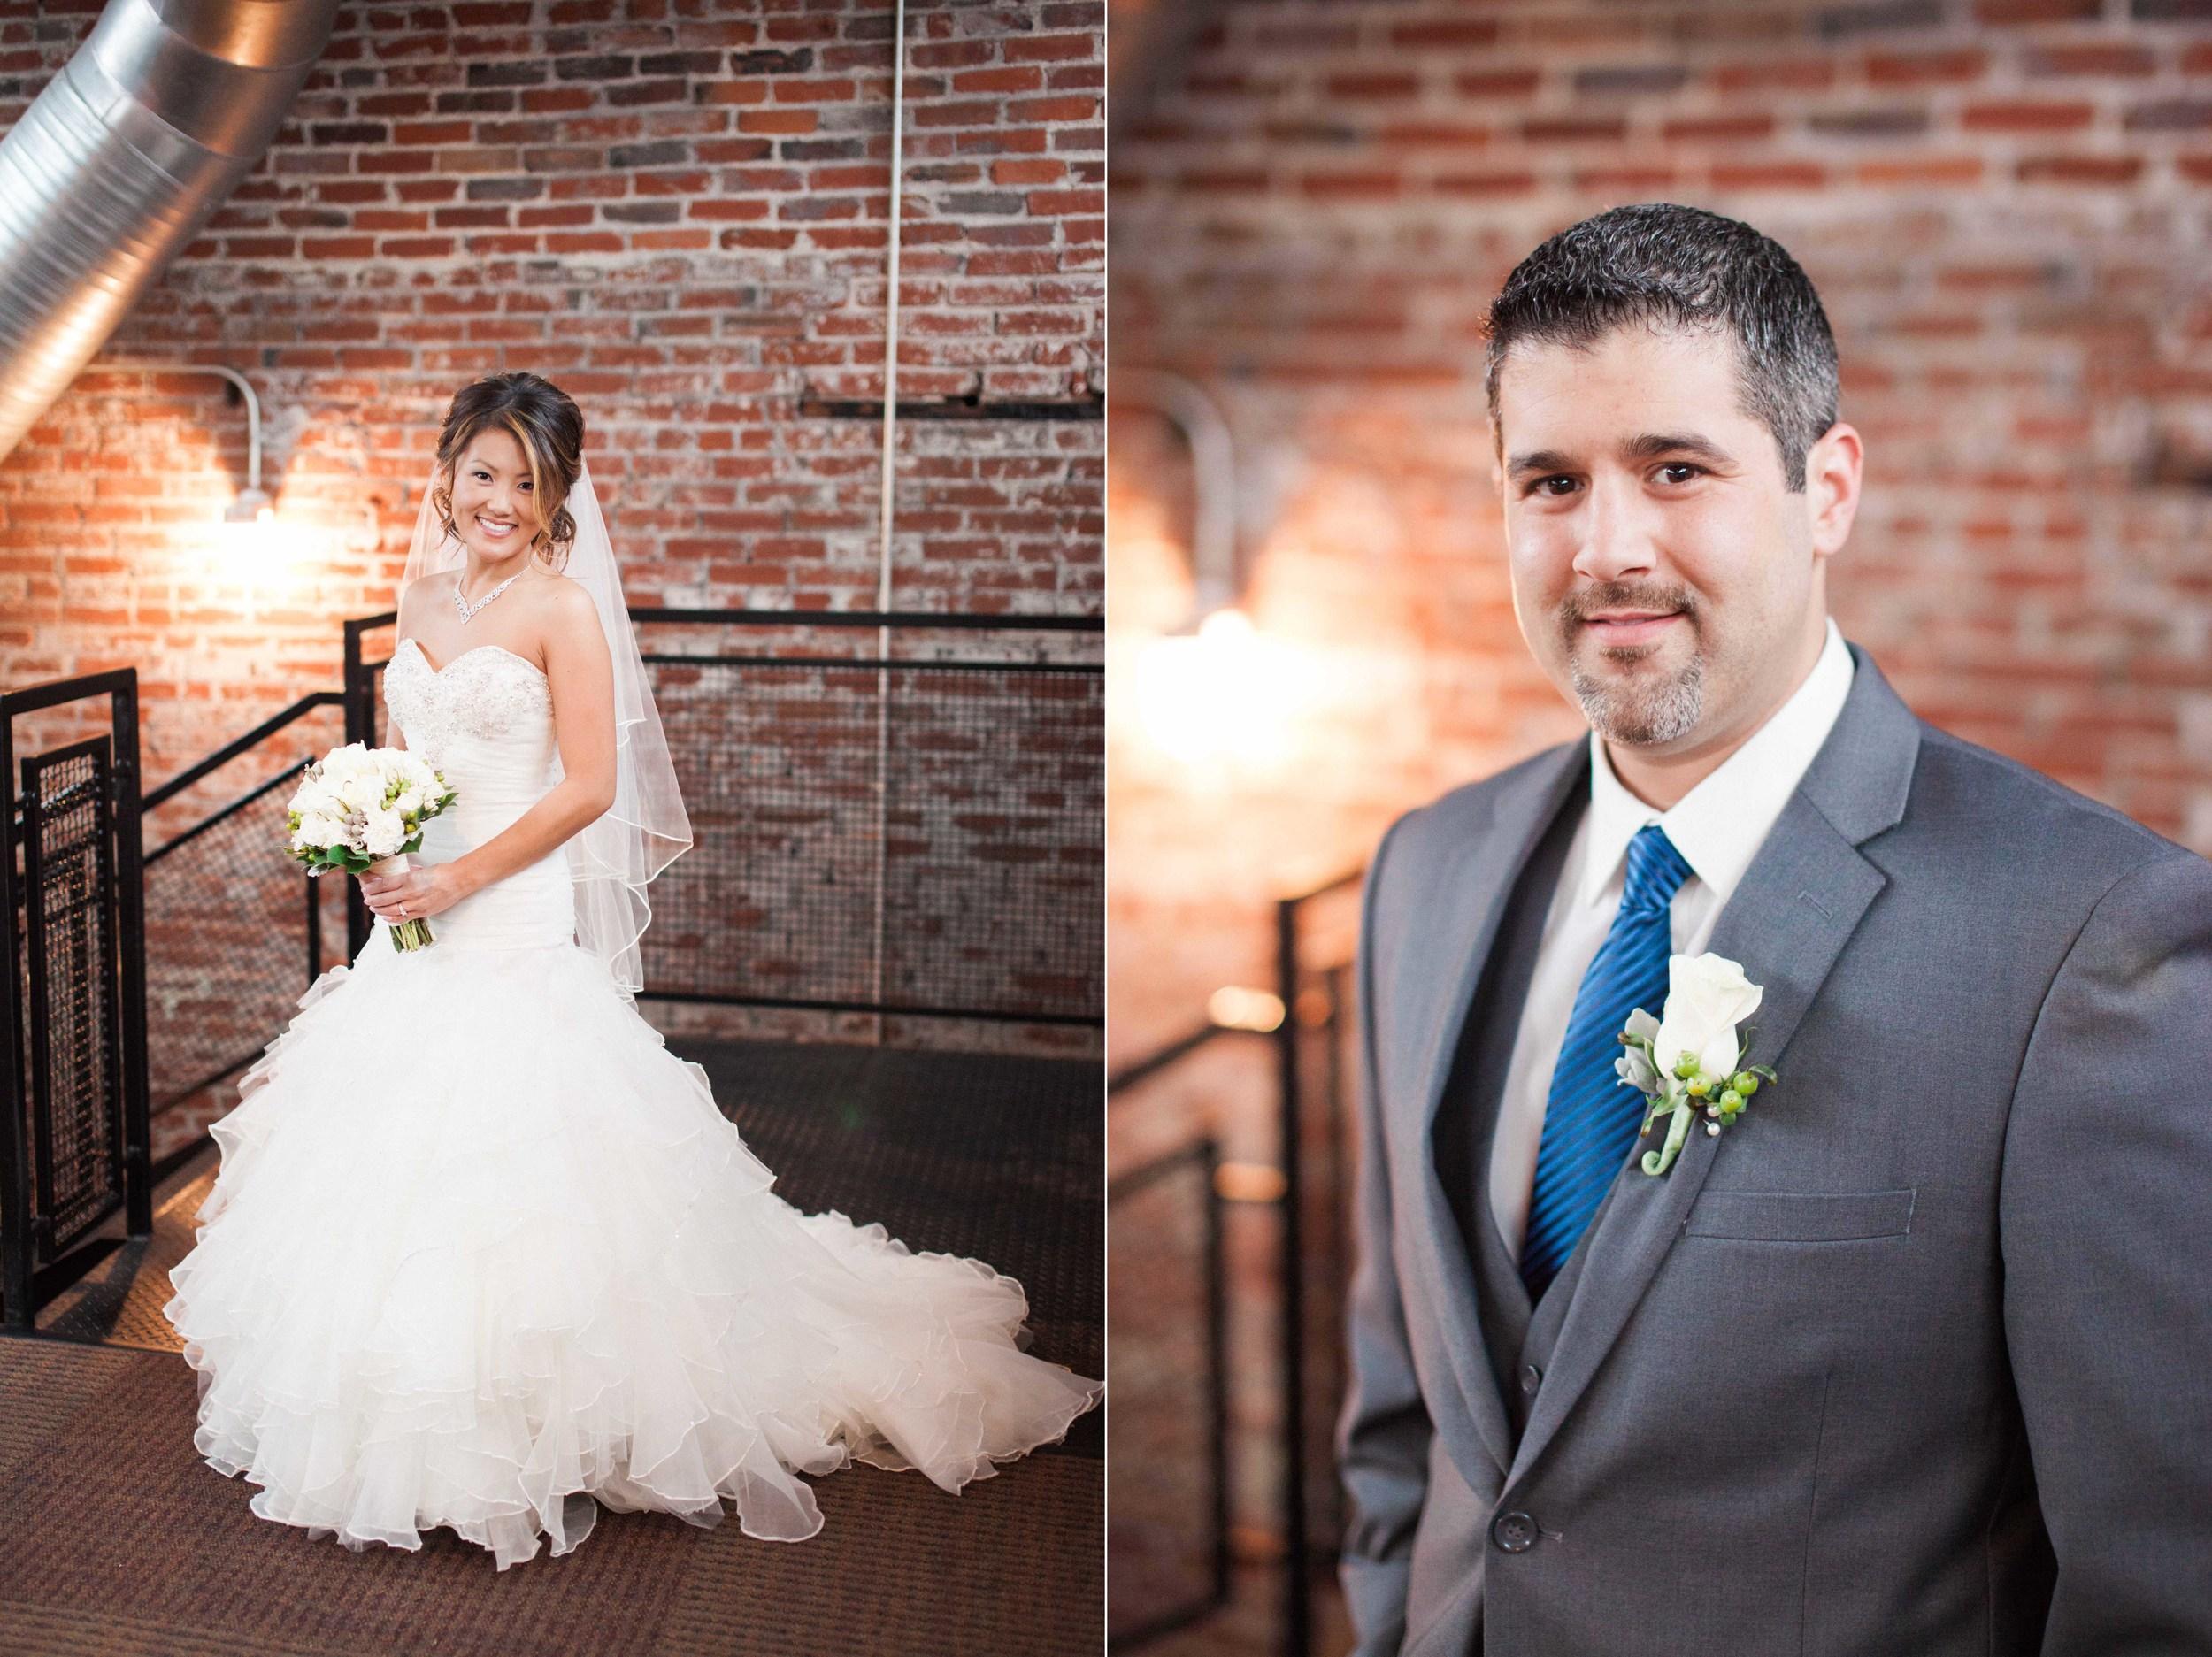 Sqwires Wedding Photos-1017 copy.jpg